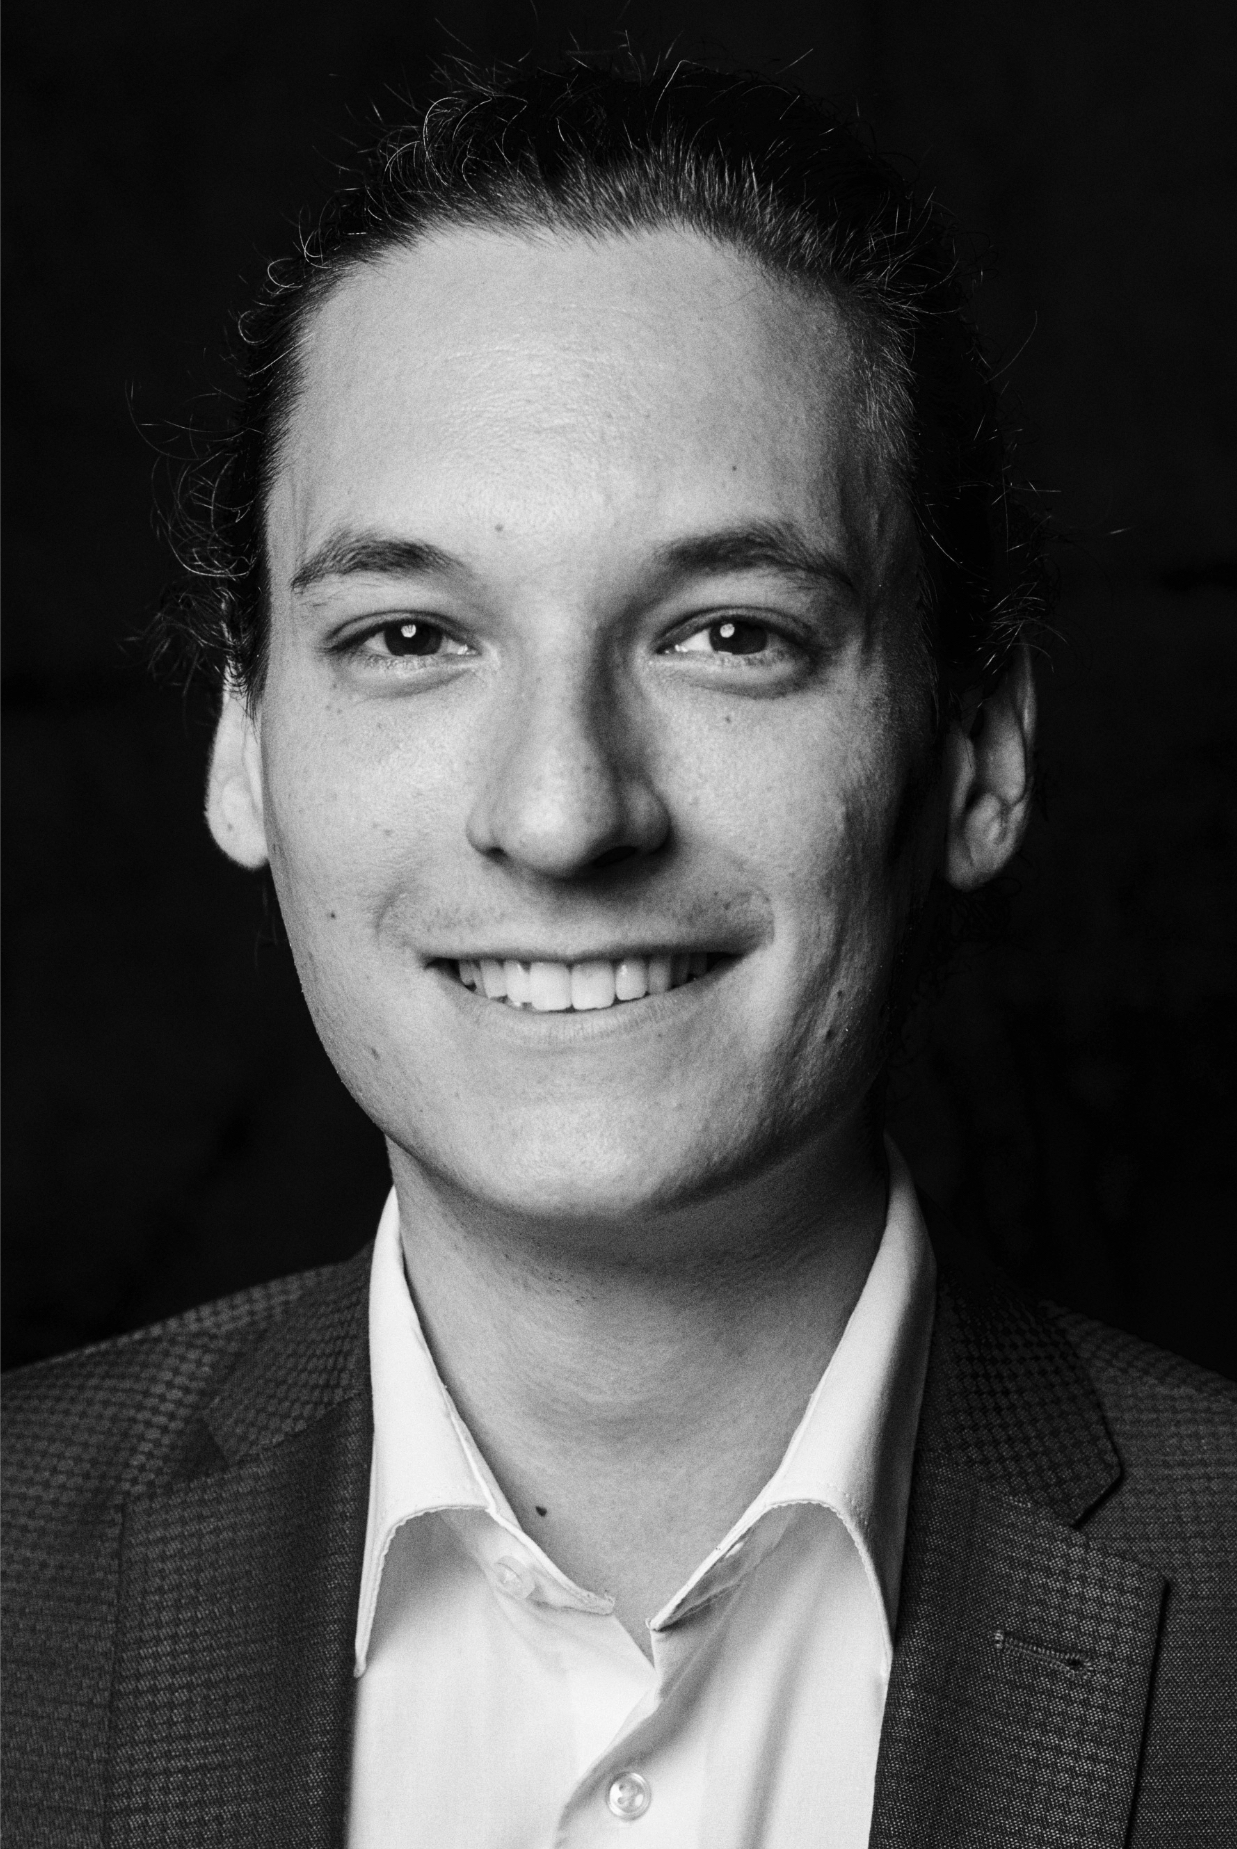 Tobias Lilienthal